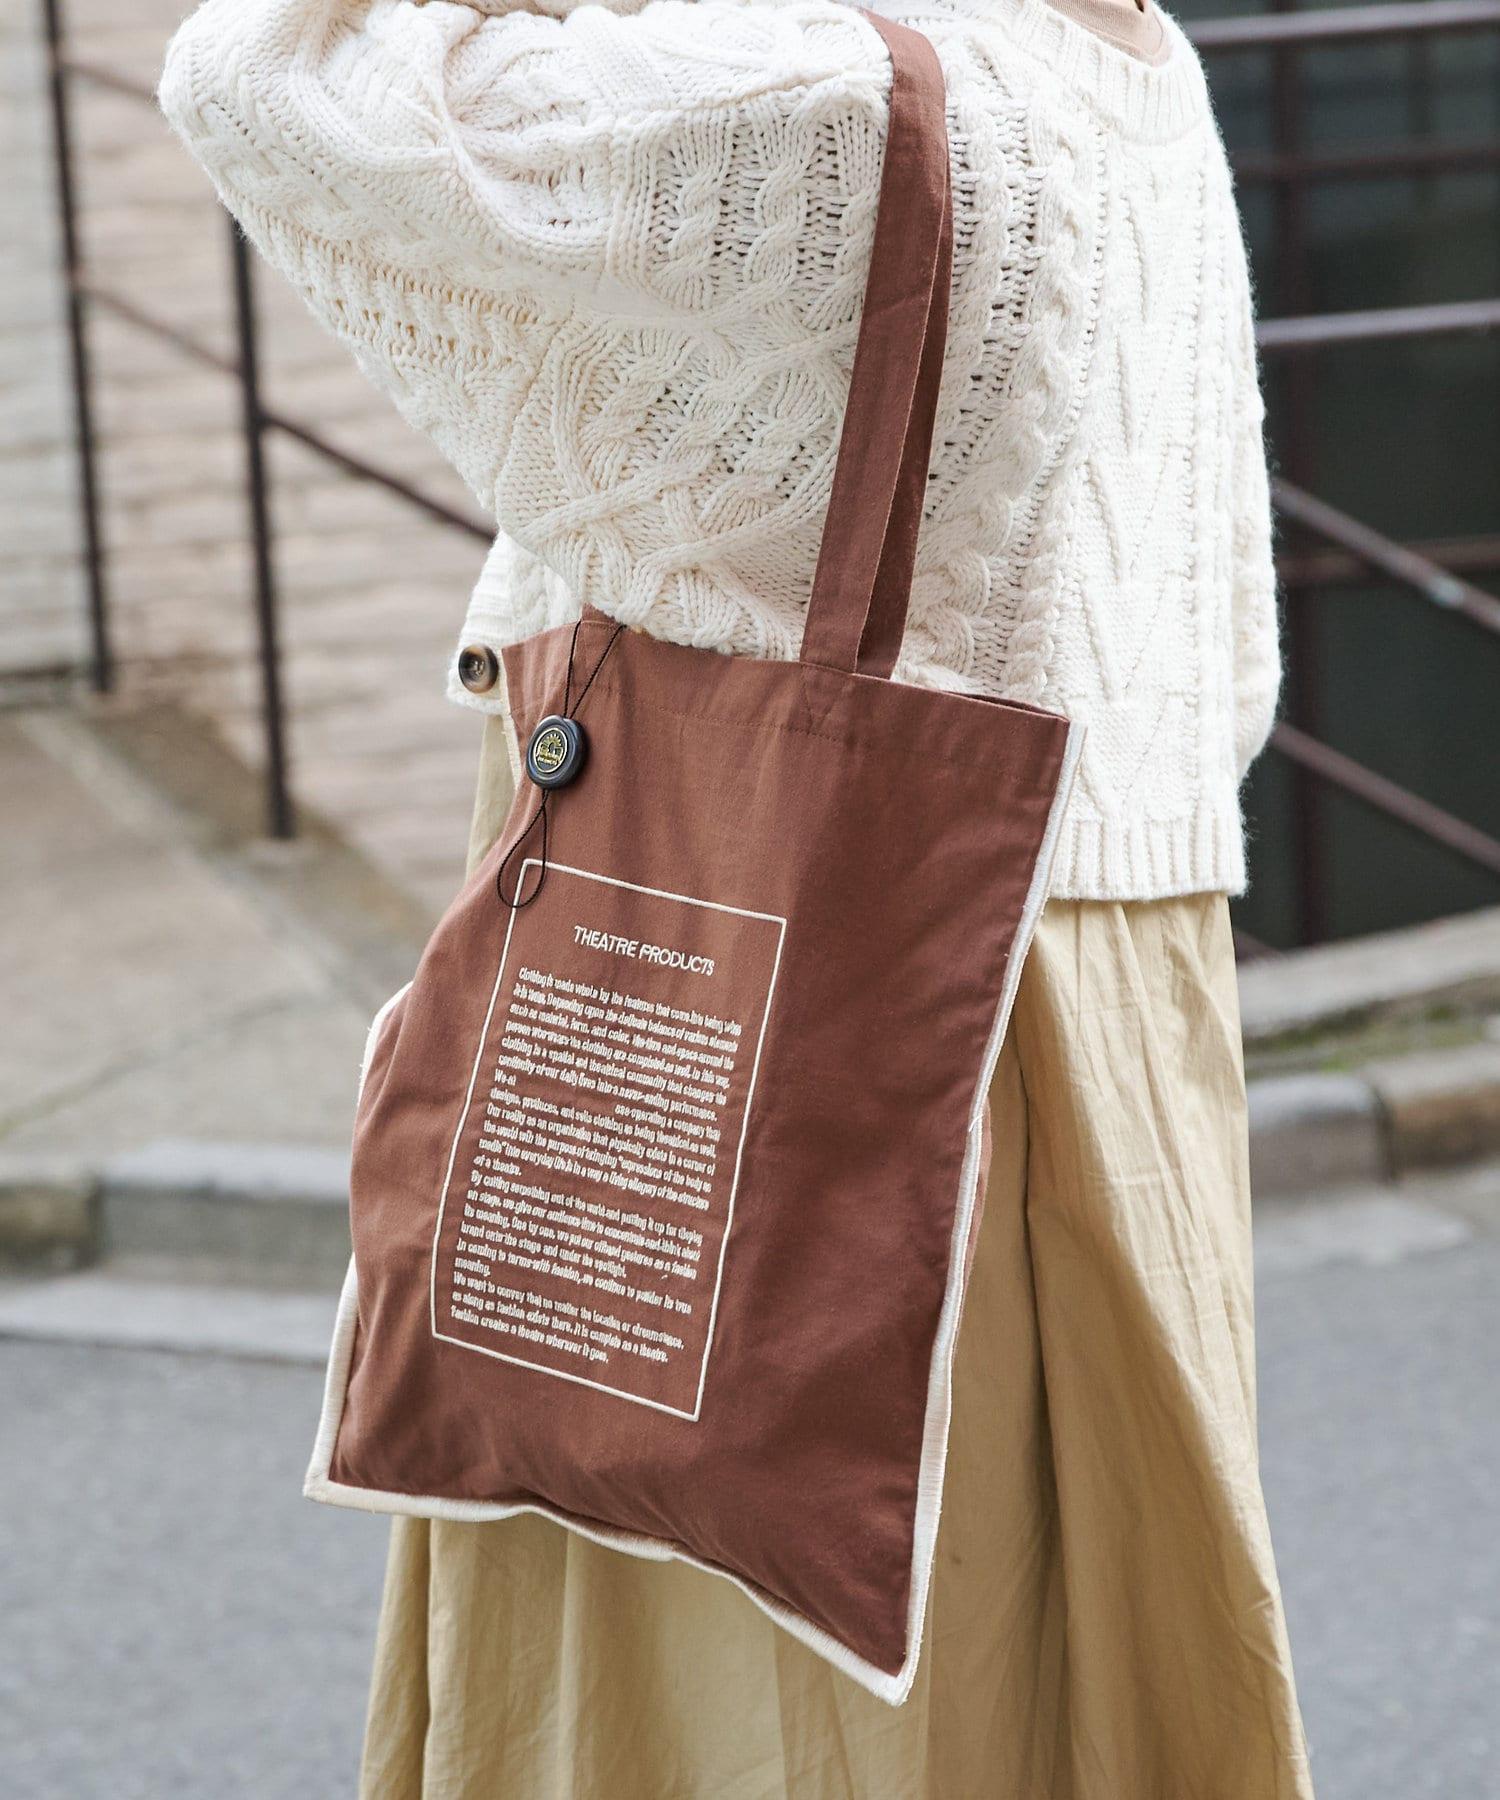 Daily russet(デイリー ラシット) 【THEATRE PRODUCTS】インフルエンサーコラボトートバッグ